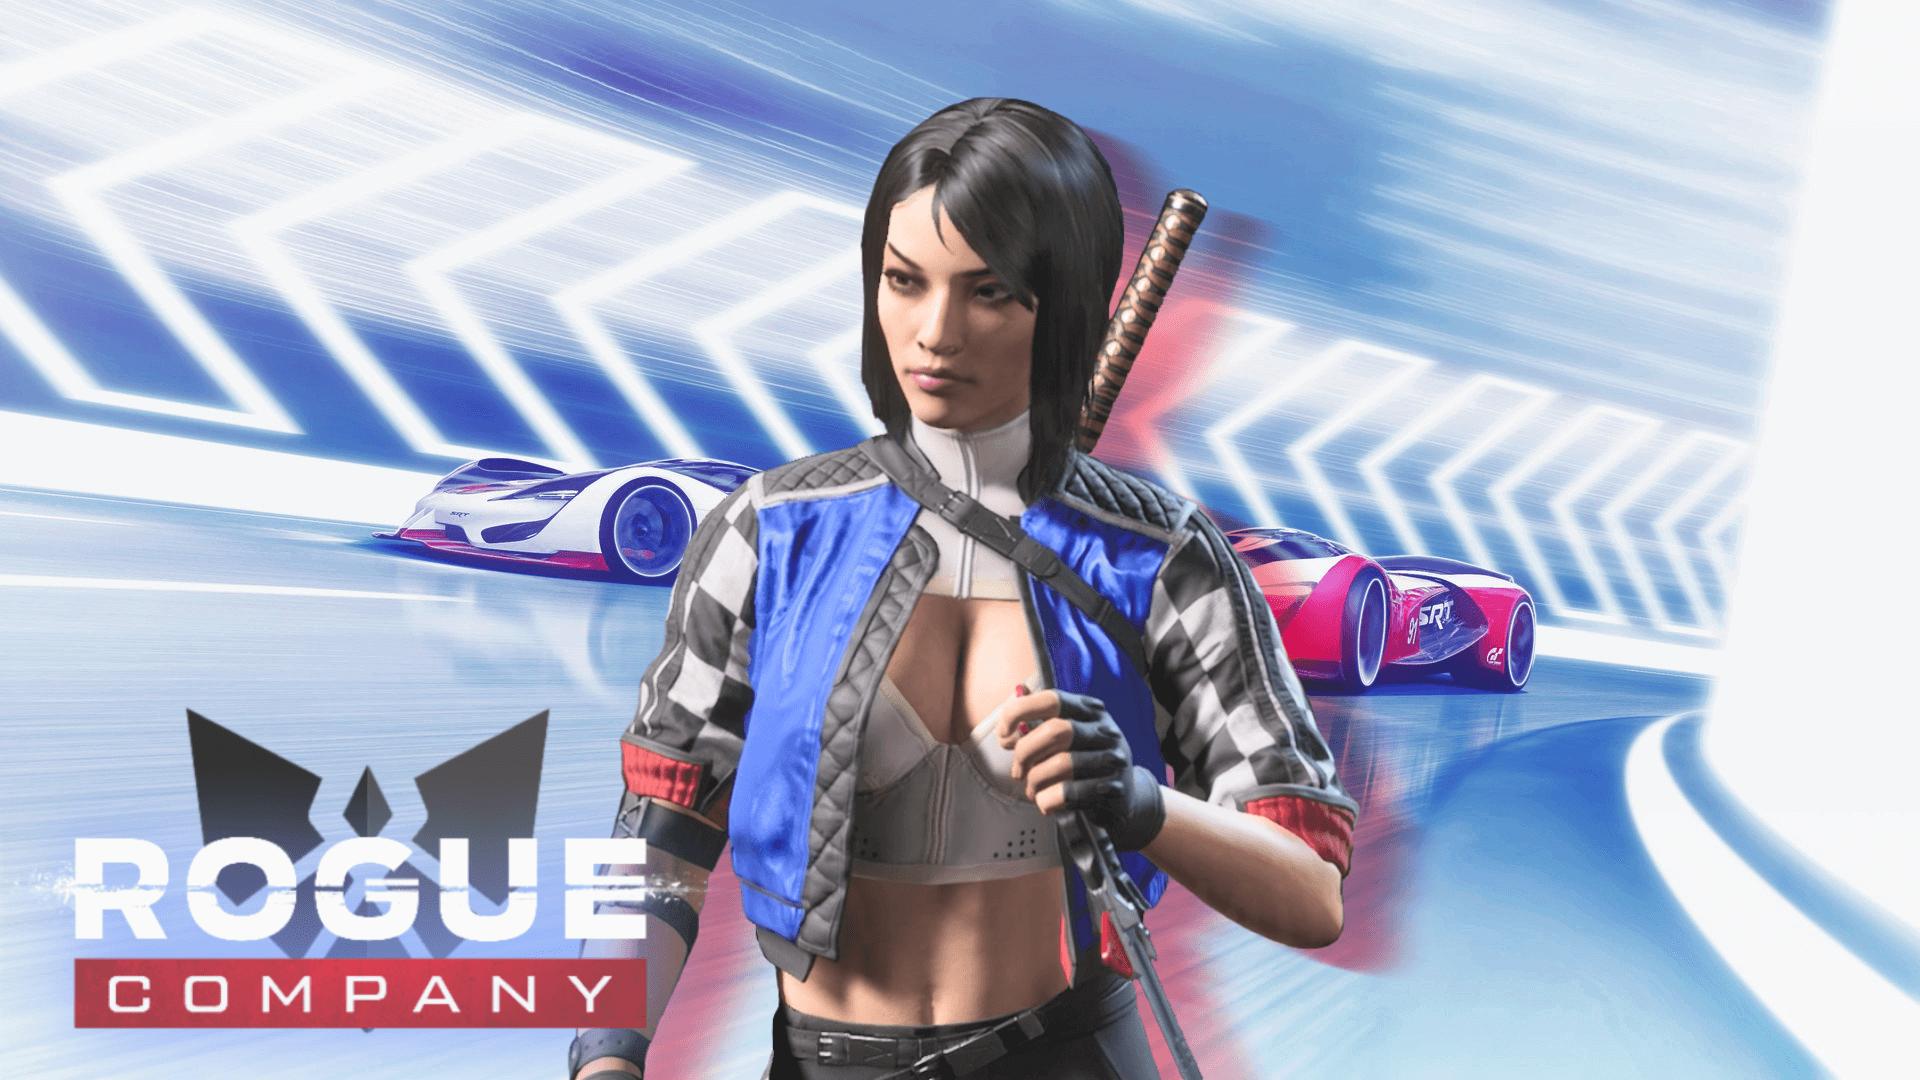 rogue company game wallpaper 74085